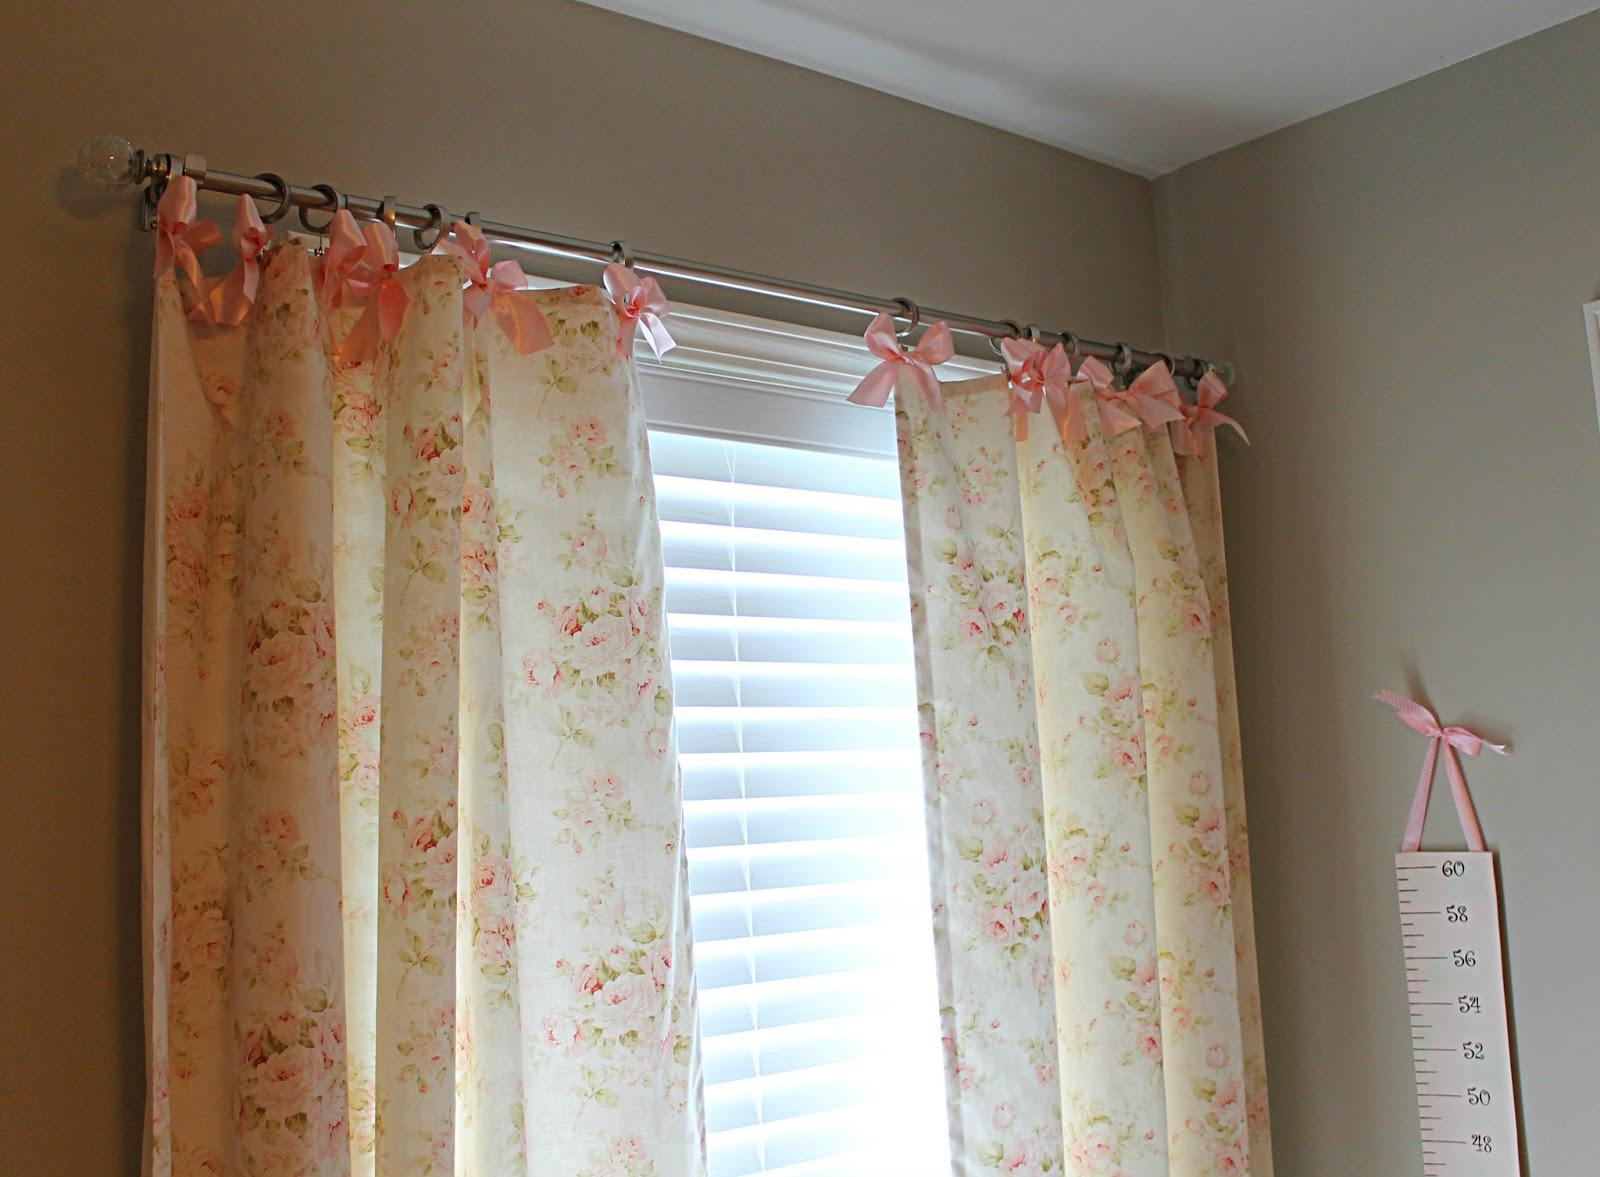 Shabby chic wall decor nursery - Front Porch Lemonades Shabby Chic Nursery Curtains